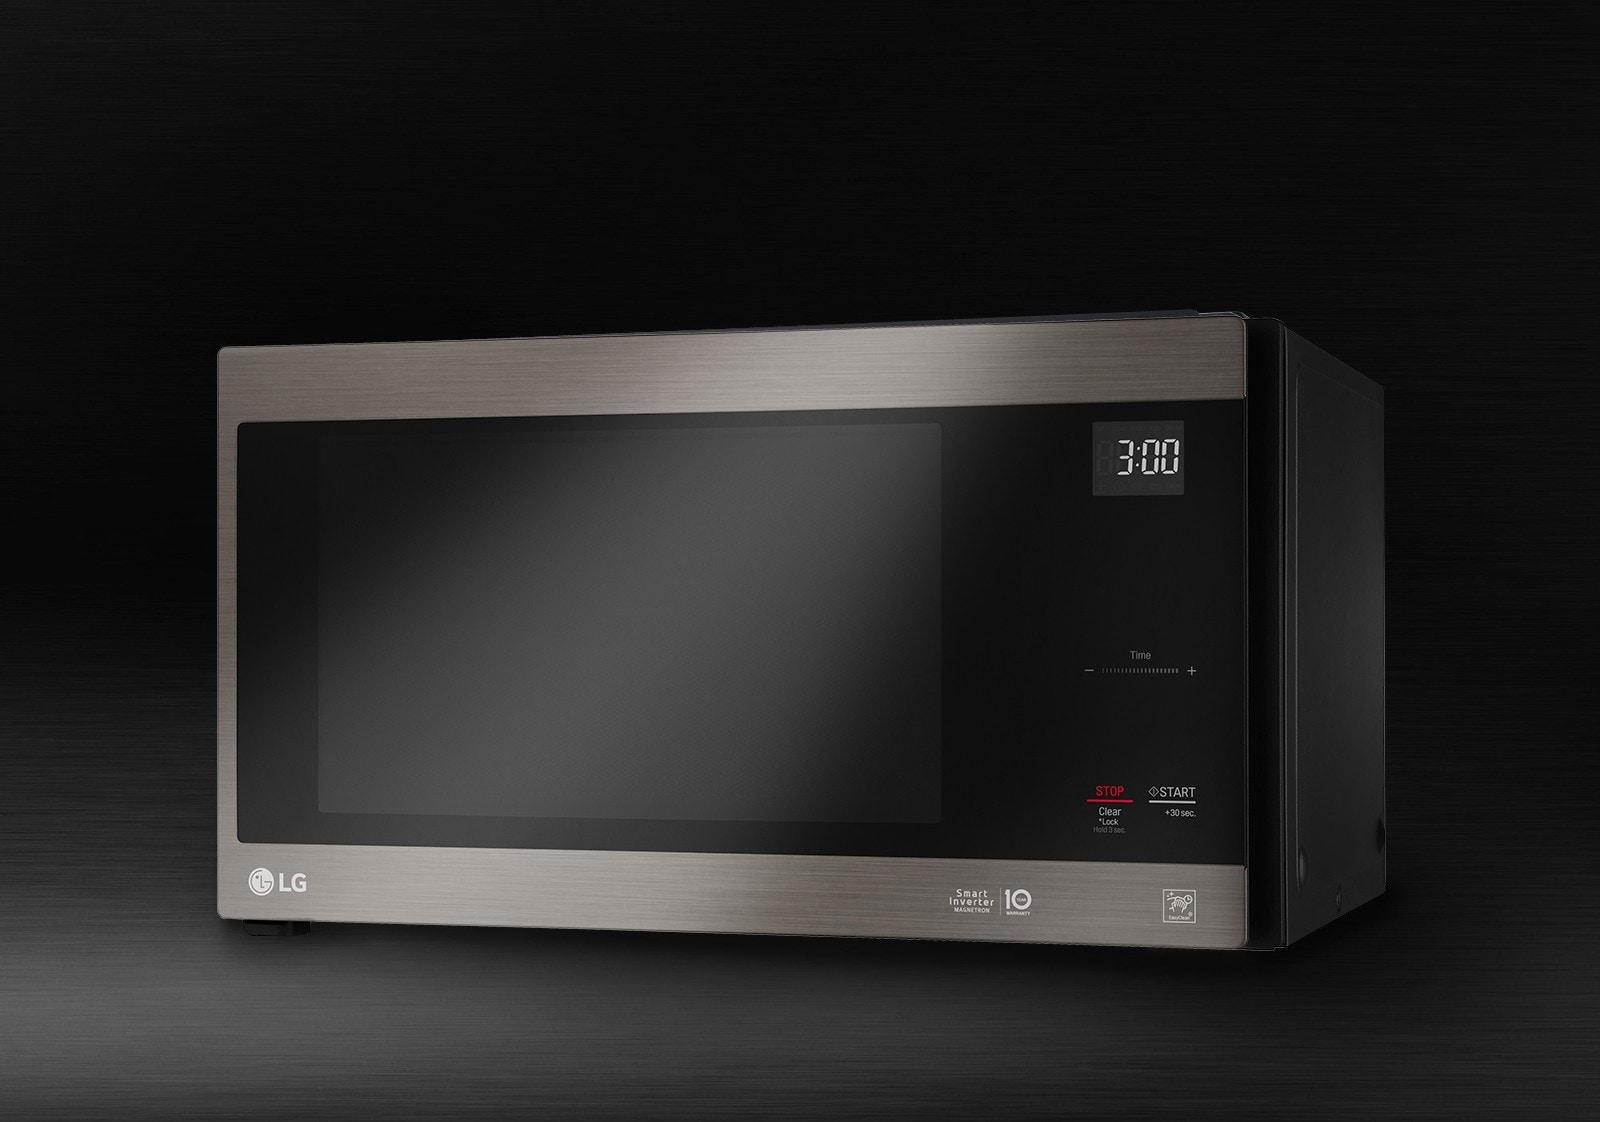 Lg Neochef 42l Smart Inverter Microwave Oven Ms4296obss